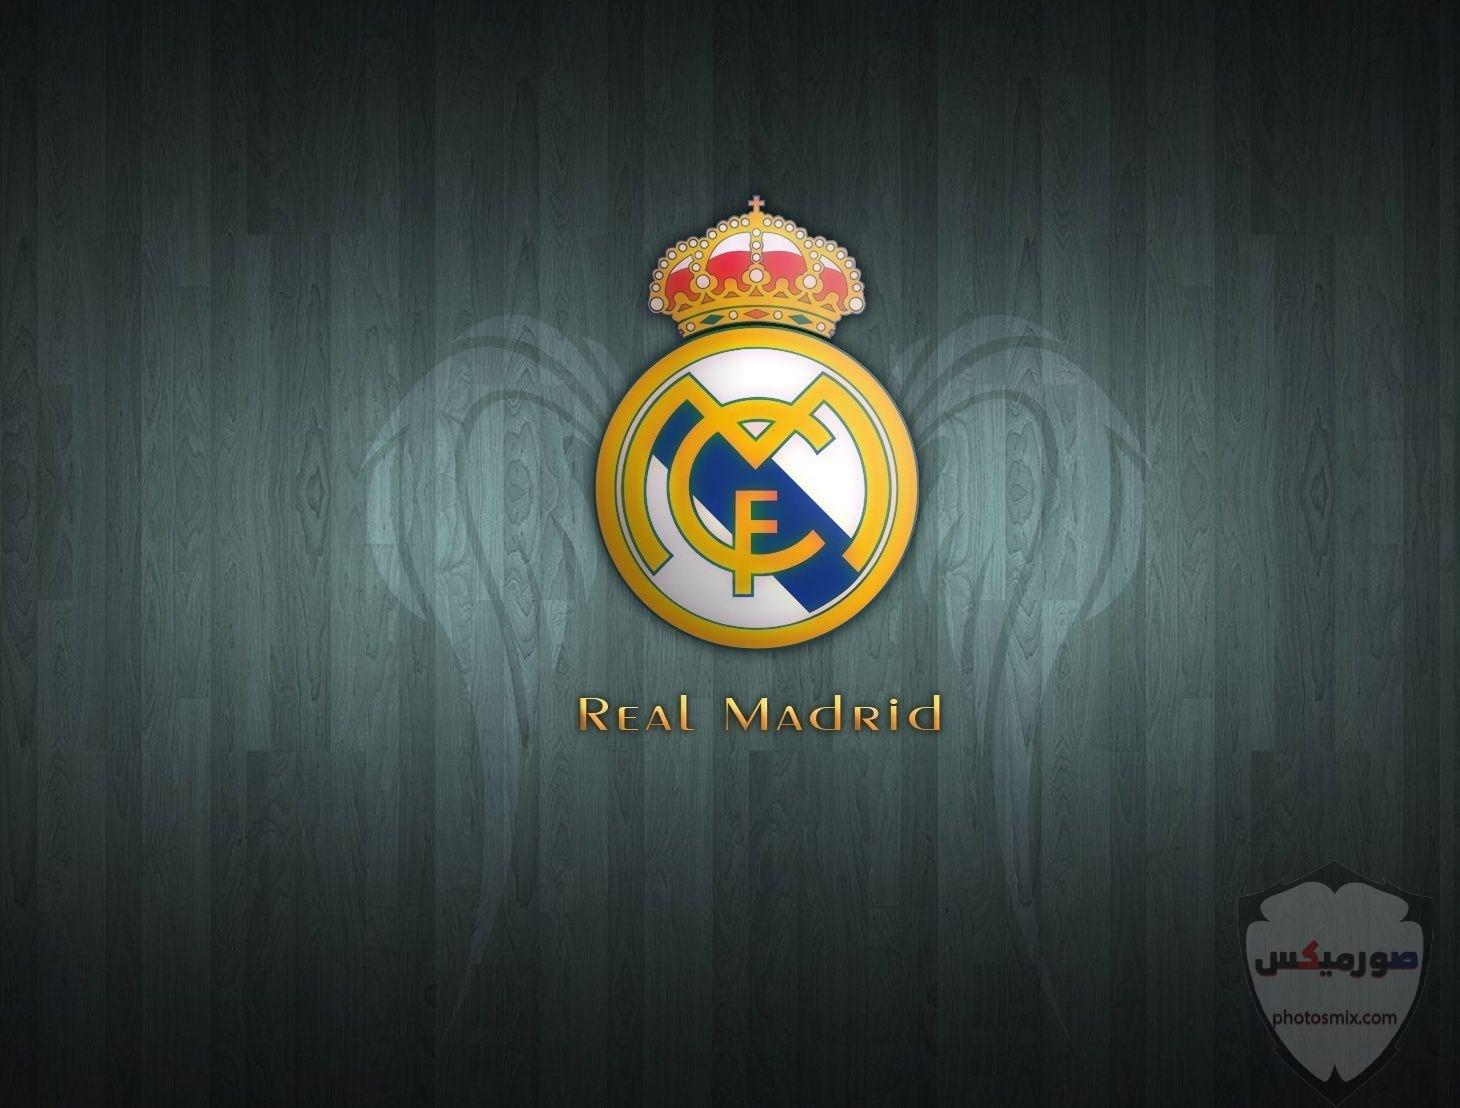 صور ريال مدريد 2020خلفيات ورمزيات ريال مدريد صور لاعبي ريال مدريد real madrid 36